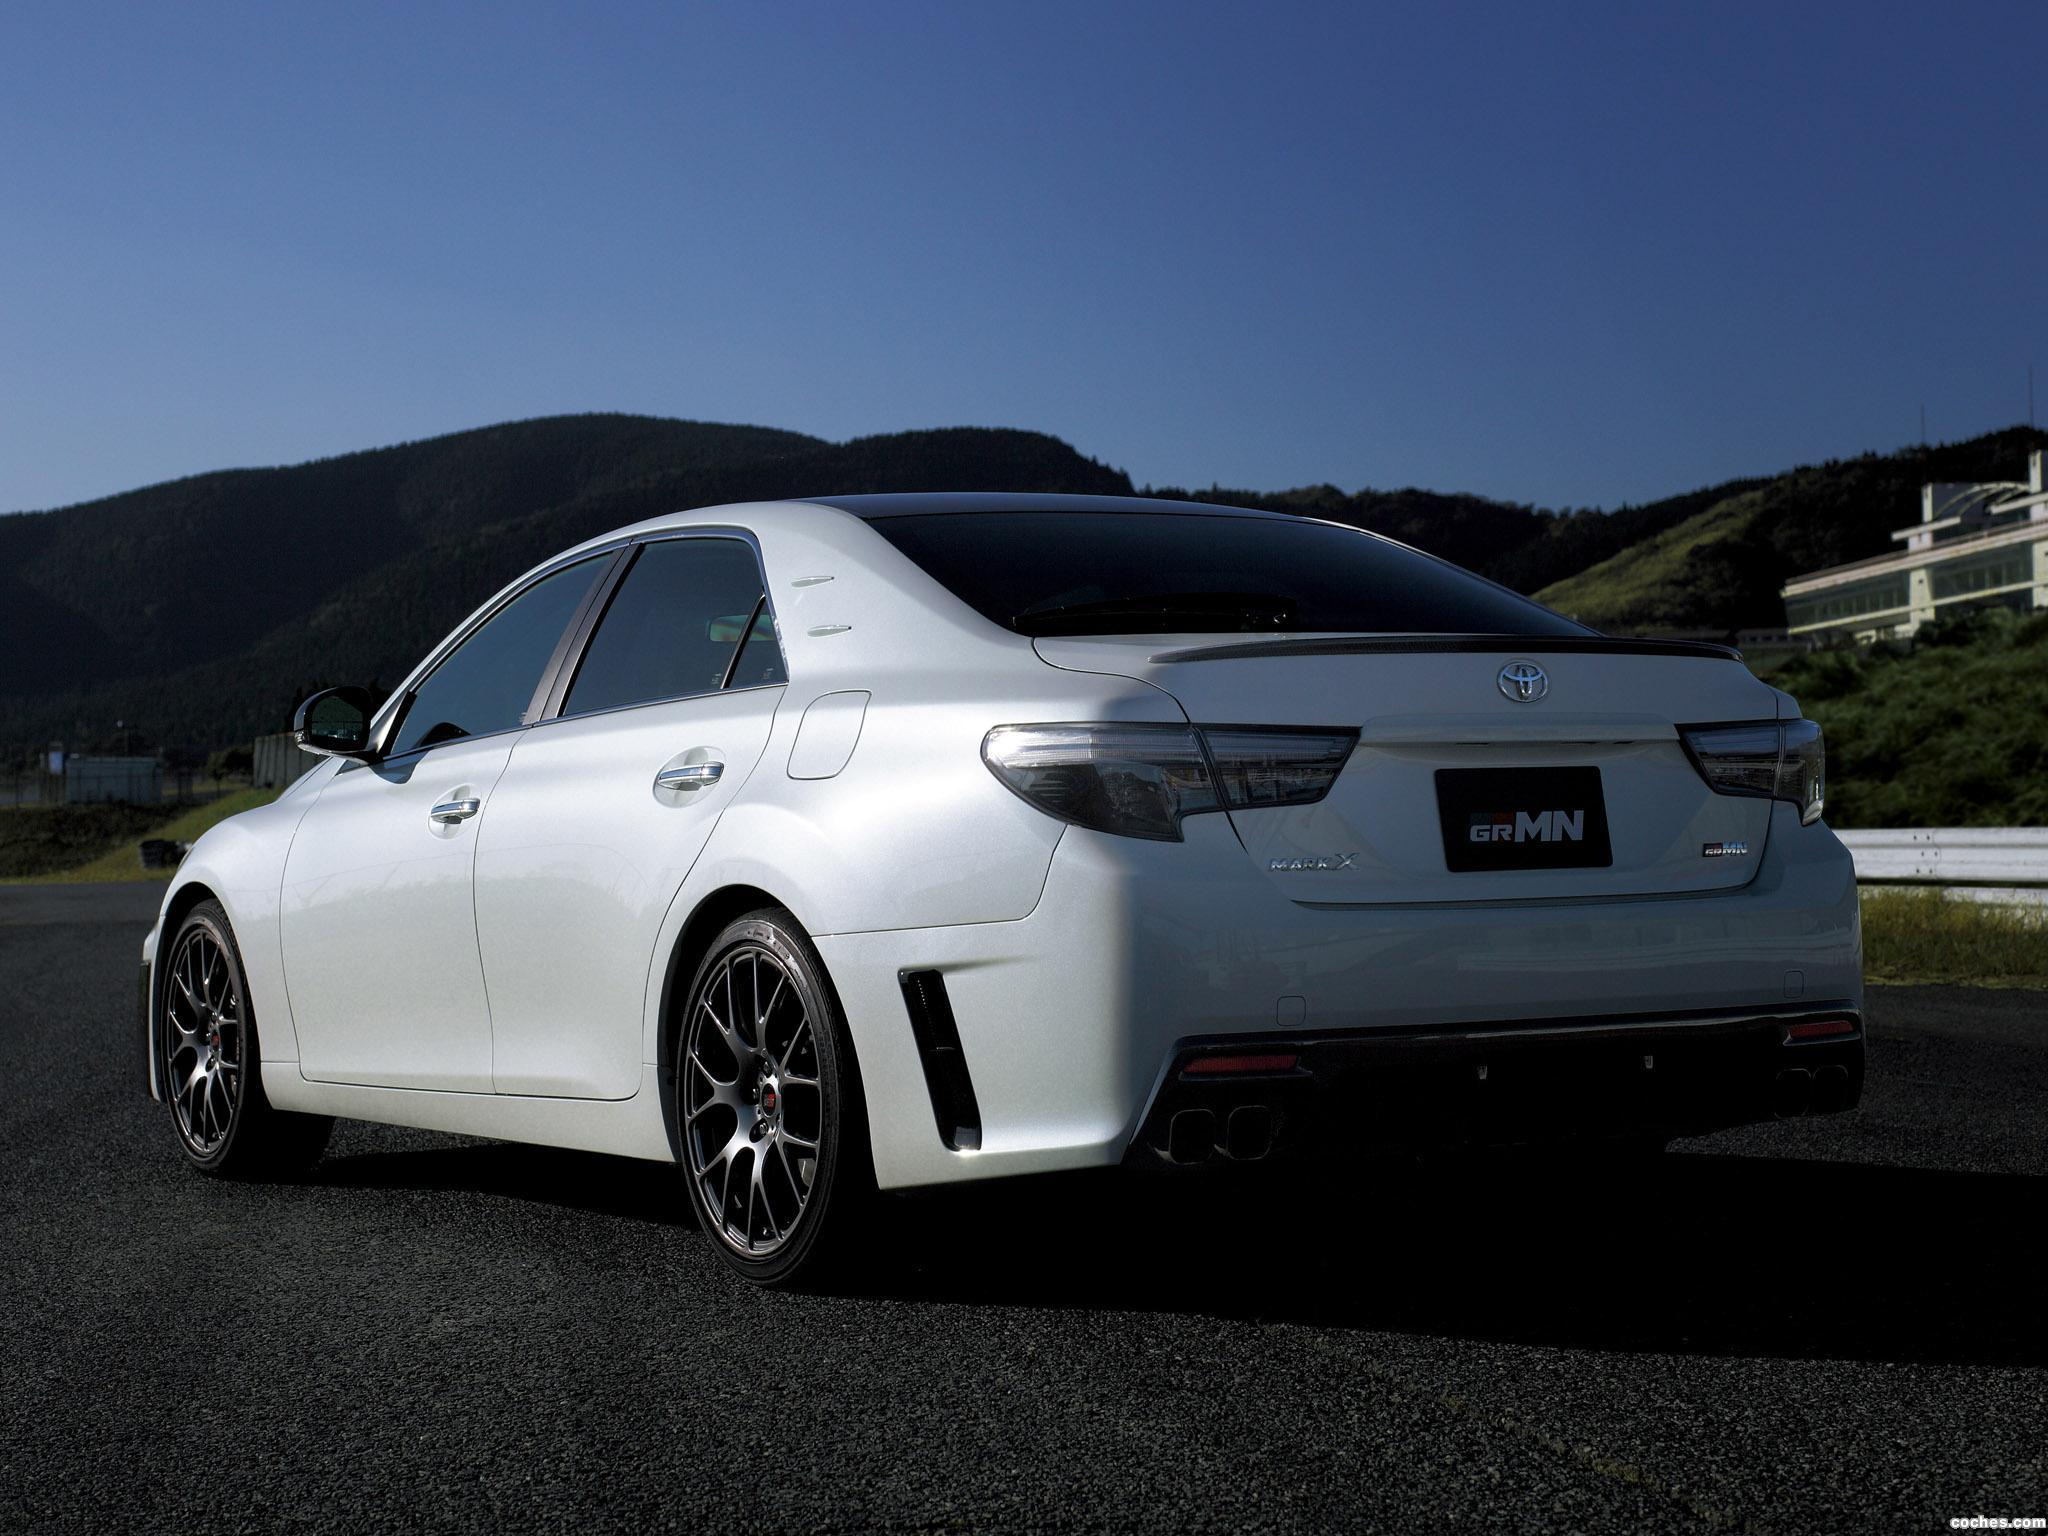 Foto 1 de GRMN Toyota Mark X GRX133 2014